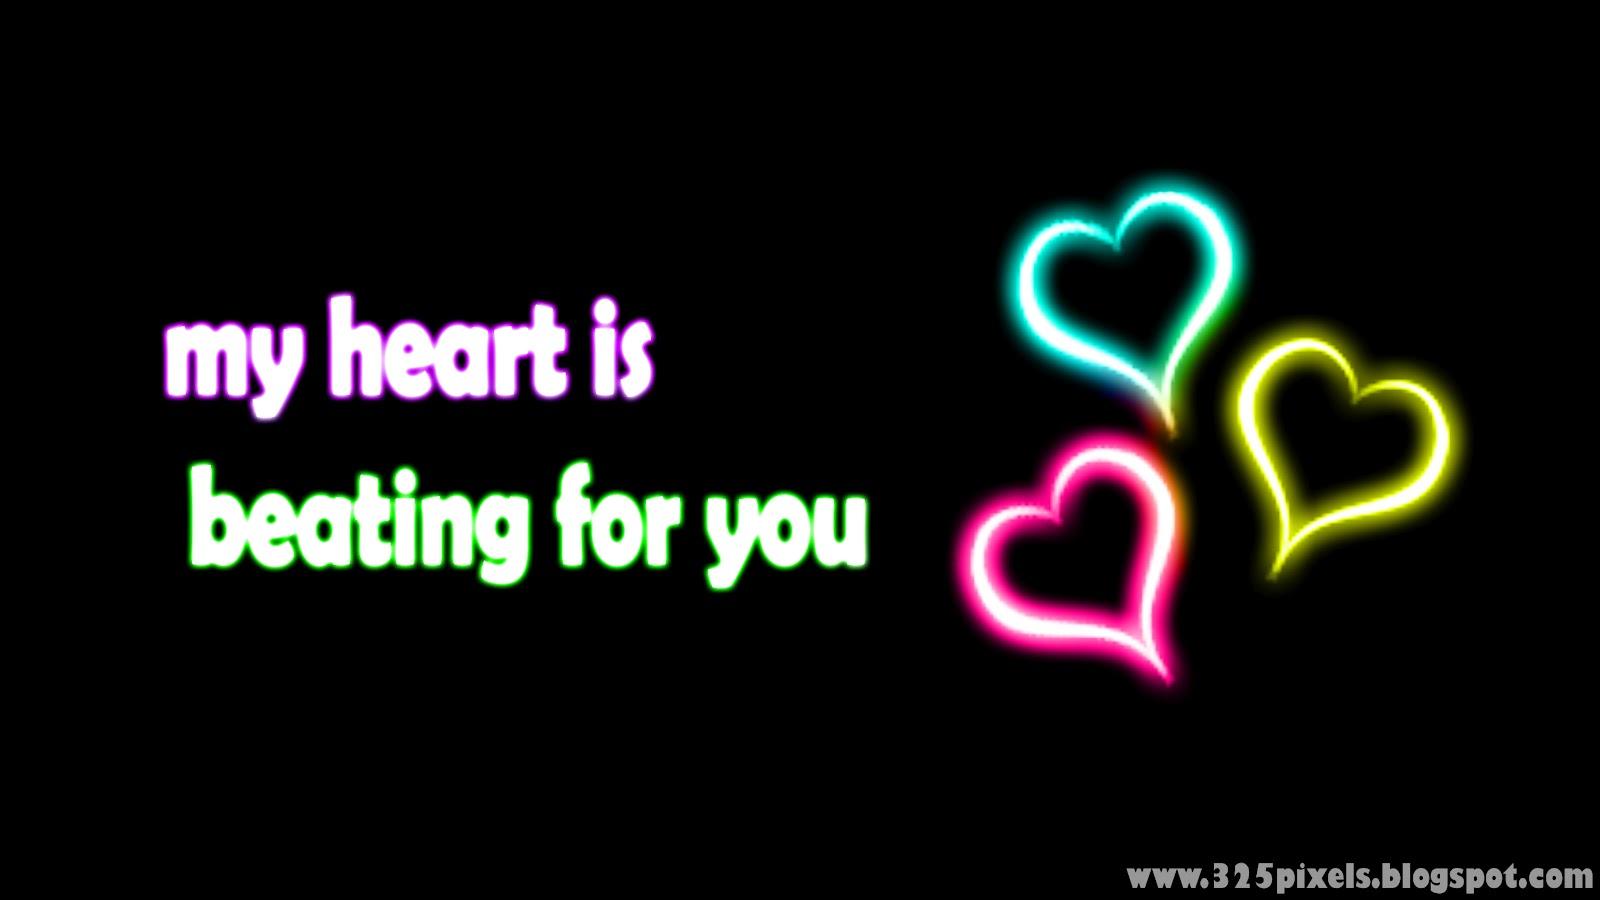 http://1.bp.blogspot.com/-Ih-SnIgxjc4/UC_j9cl7diI/AAAAAAAAAX8/XLoCMg465Yg/s1600/love3.jpg